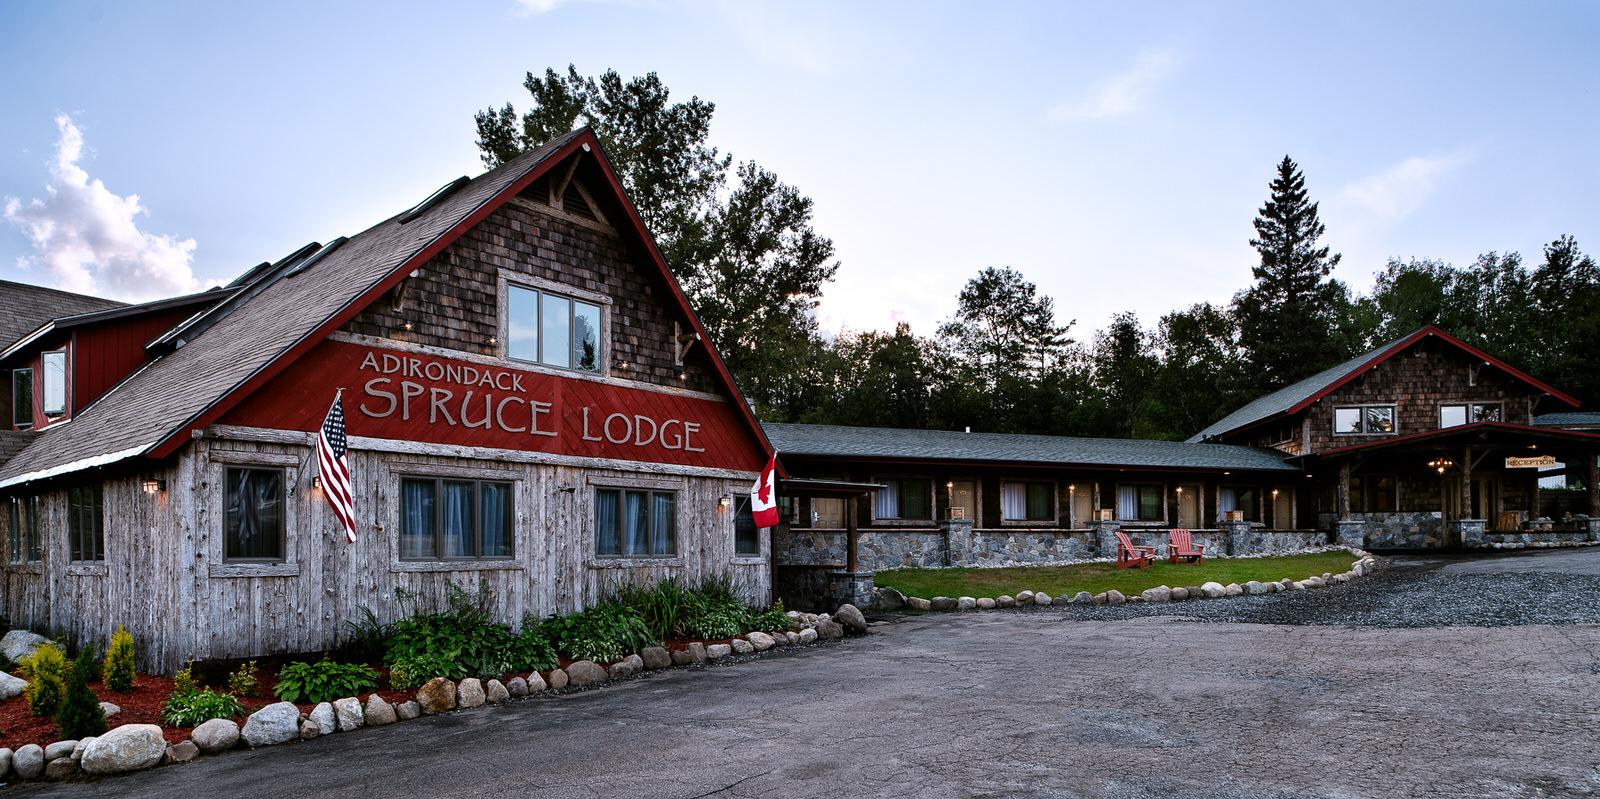 Adk-Spruce-Lodge-2048px-53.jpg